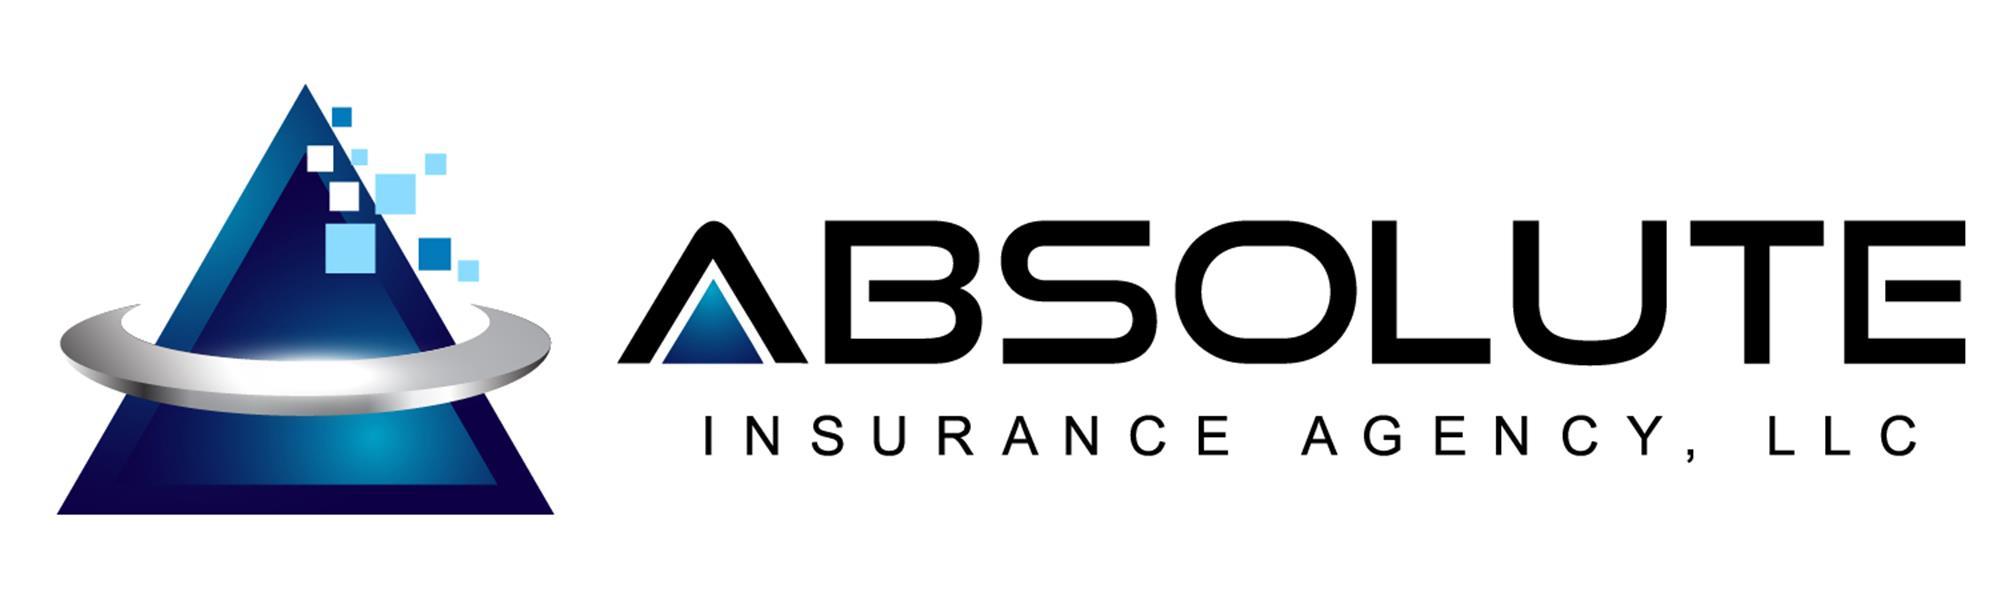 Absolute Insurance Agency, LLC